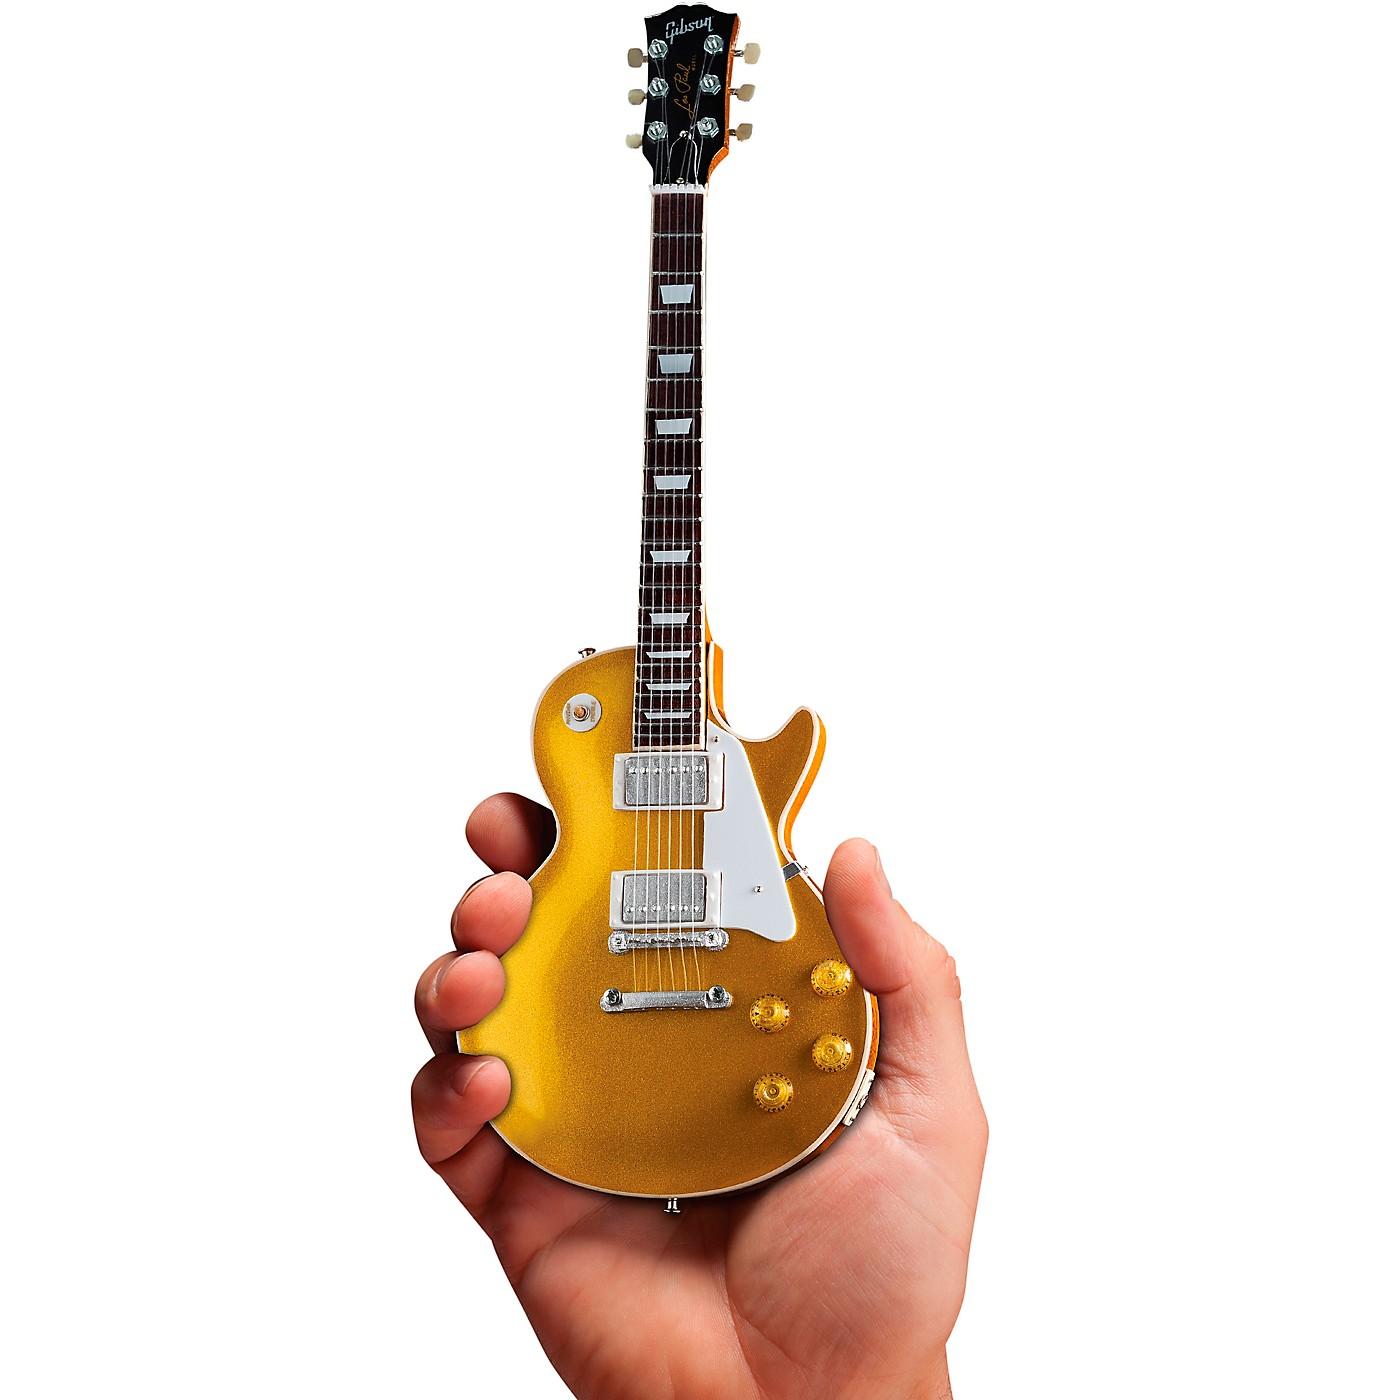 Axe Heaven Gibson 1957 Les Paul Gold Top Officially Licensed Miniature Guitar Replica thumbnail